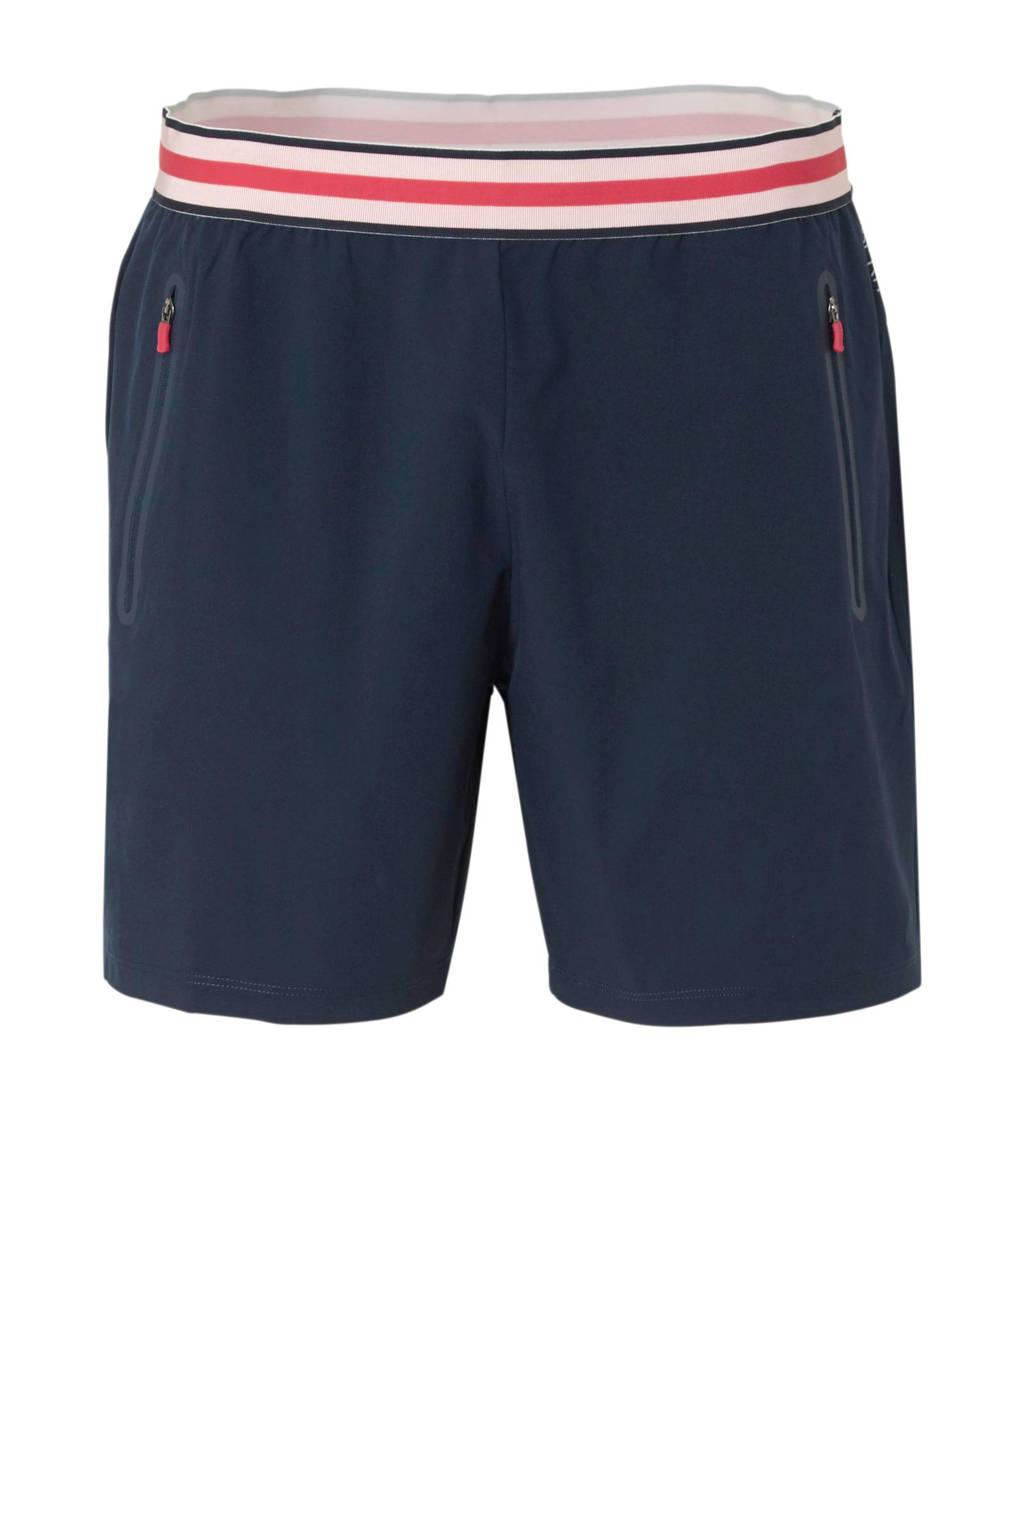 ESPRIT Women Sports short, Donkerblauw/roze/rood